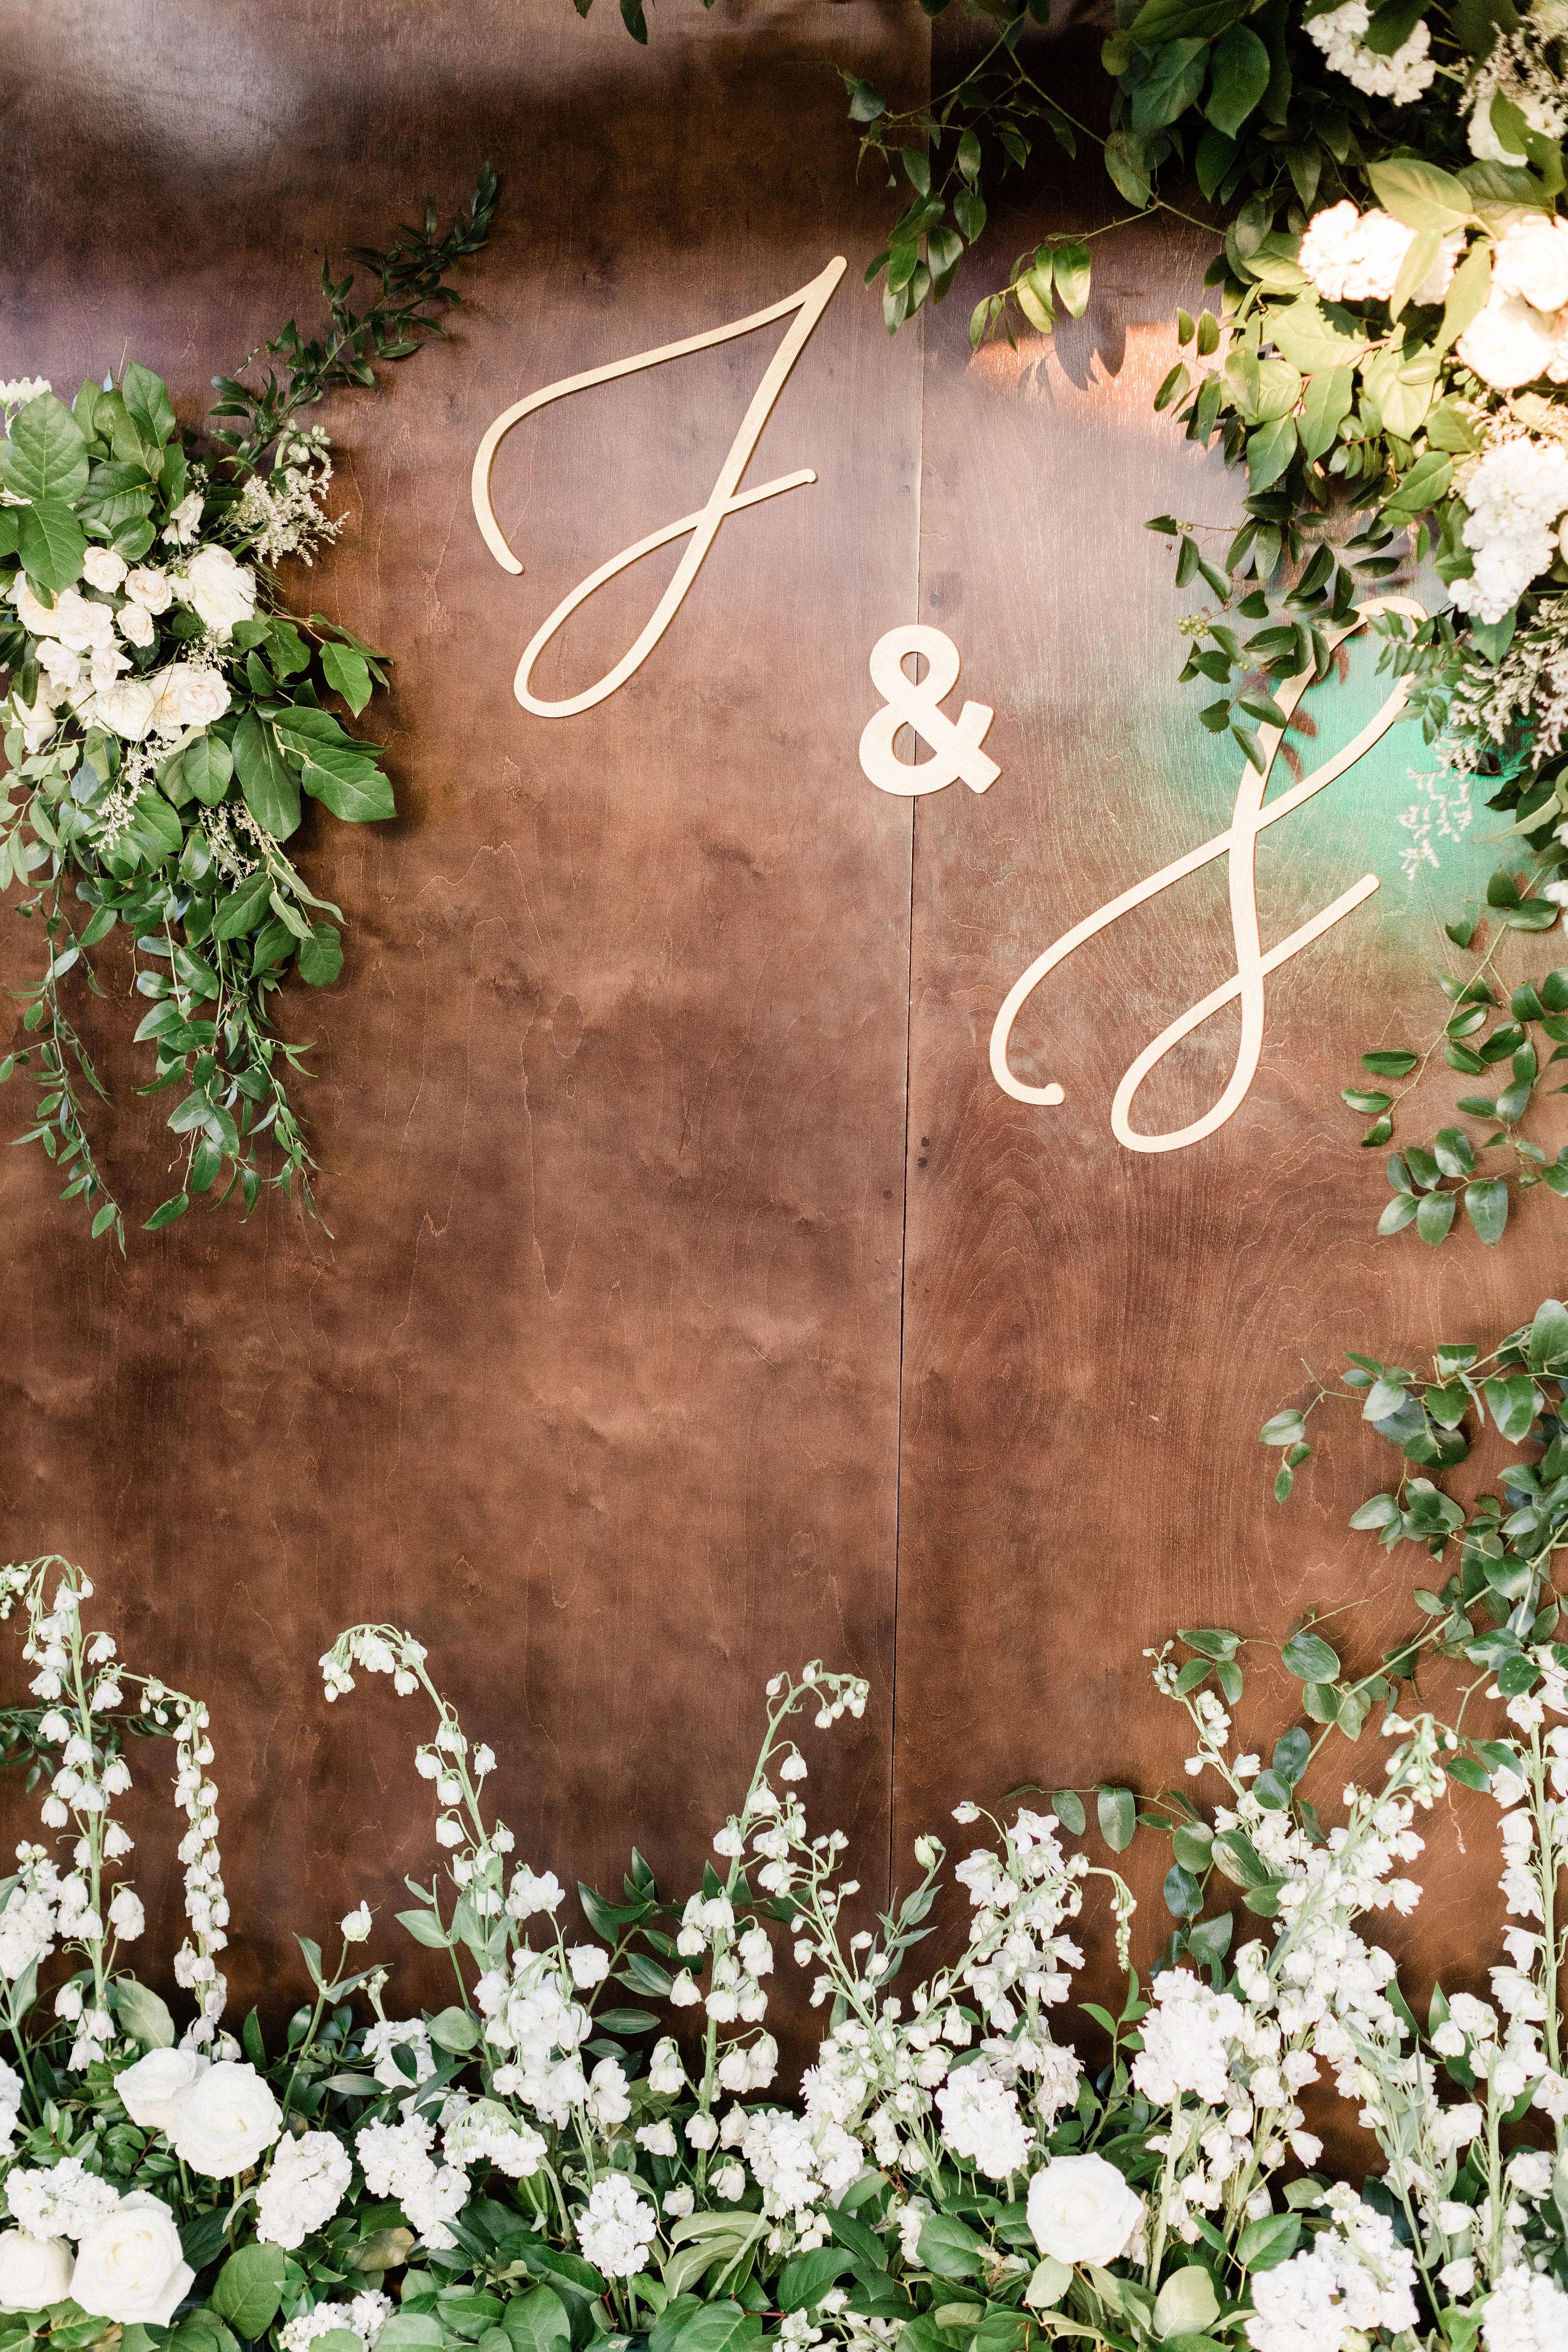 Jenny-Quicksall-Photography-serendipity-gardens-54.jpg